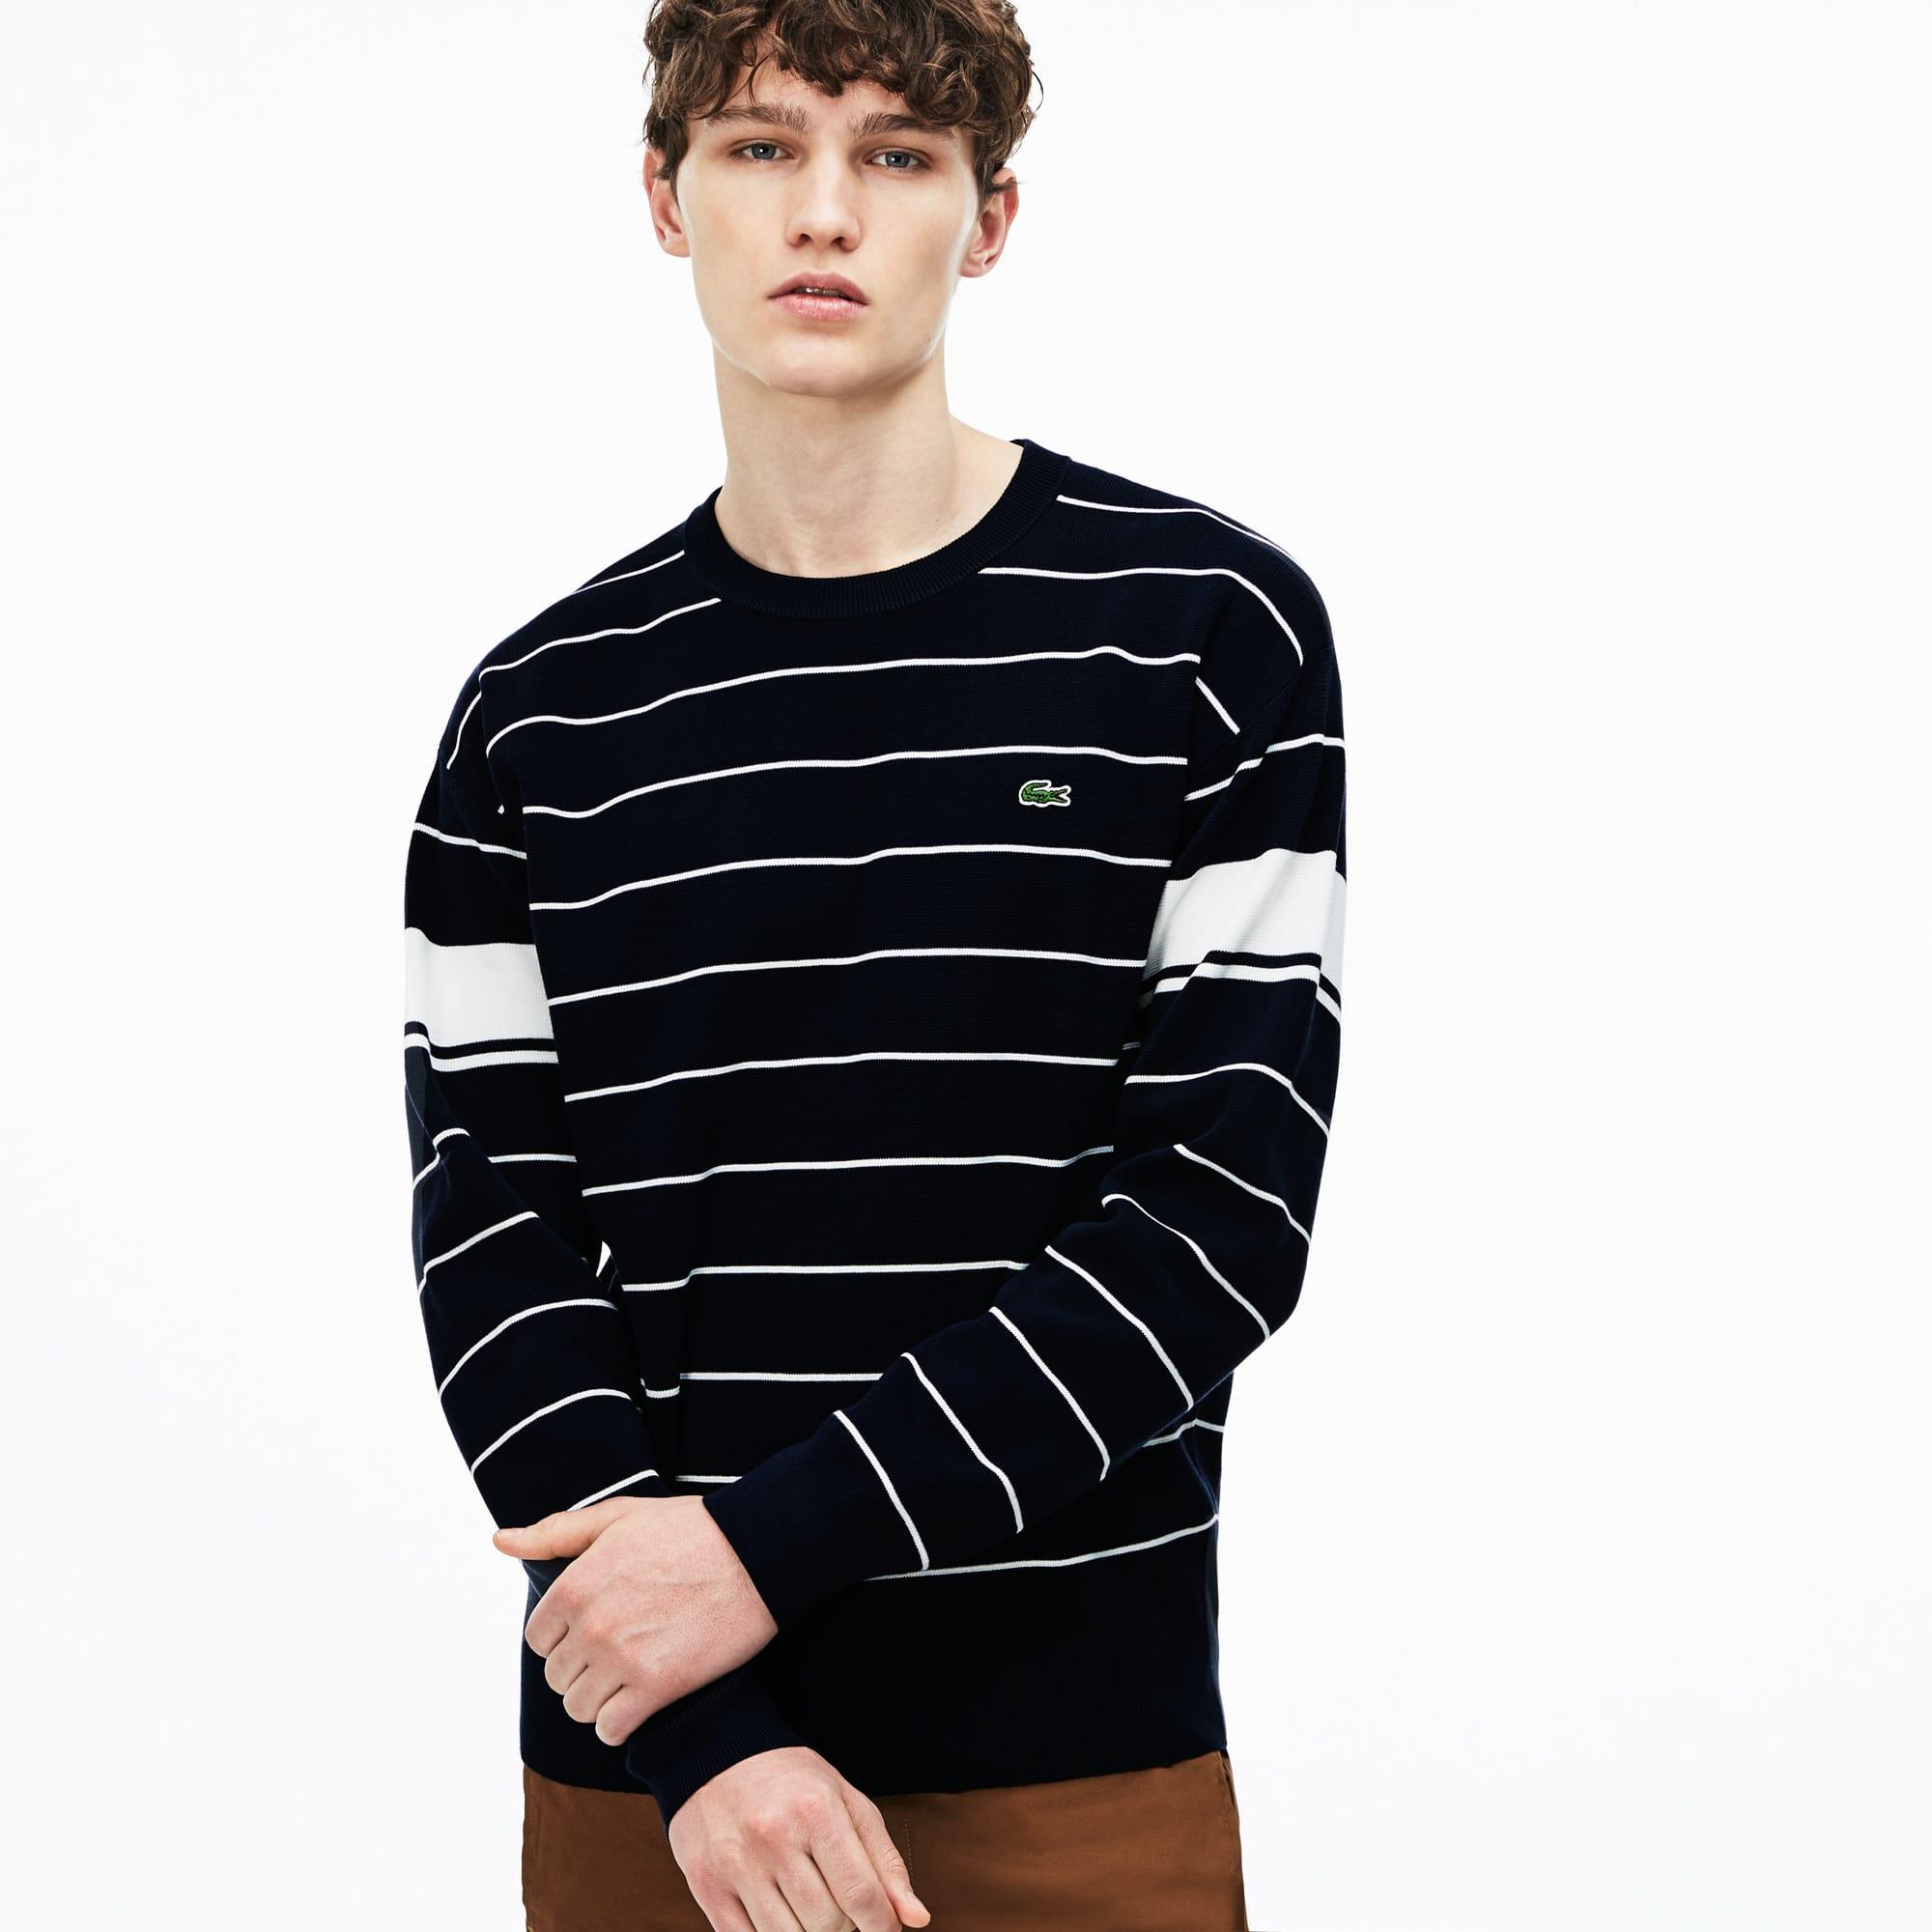 Men's Crew Neck Contrast Bands Striped Milano Cotton Sweater